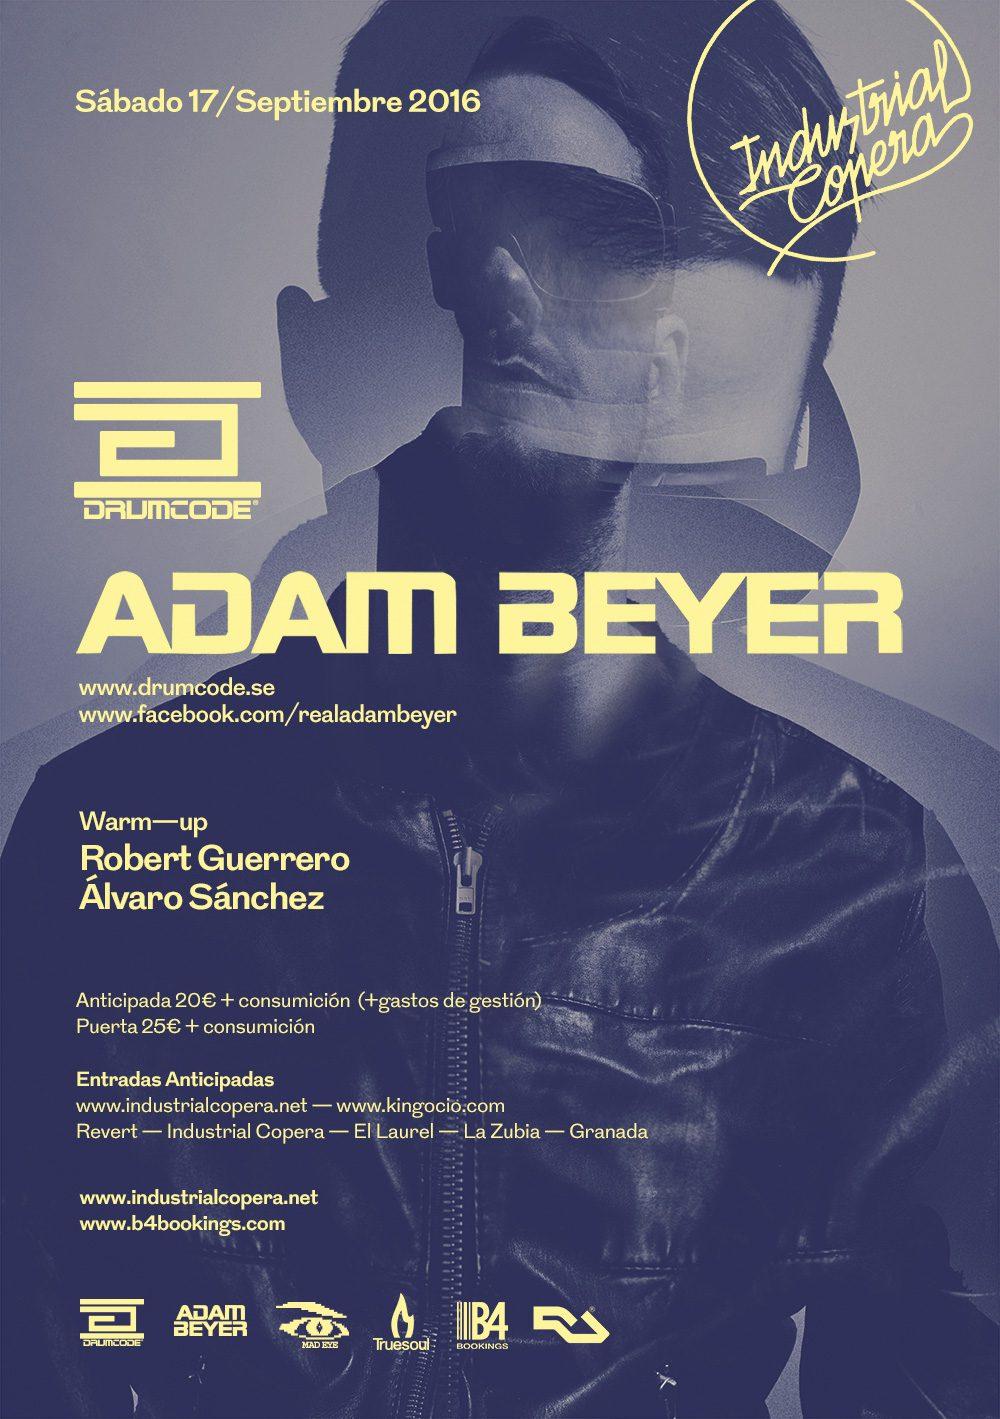 adambeyer-industrialcopera-325yuinkgyvi289w9v8l4w